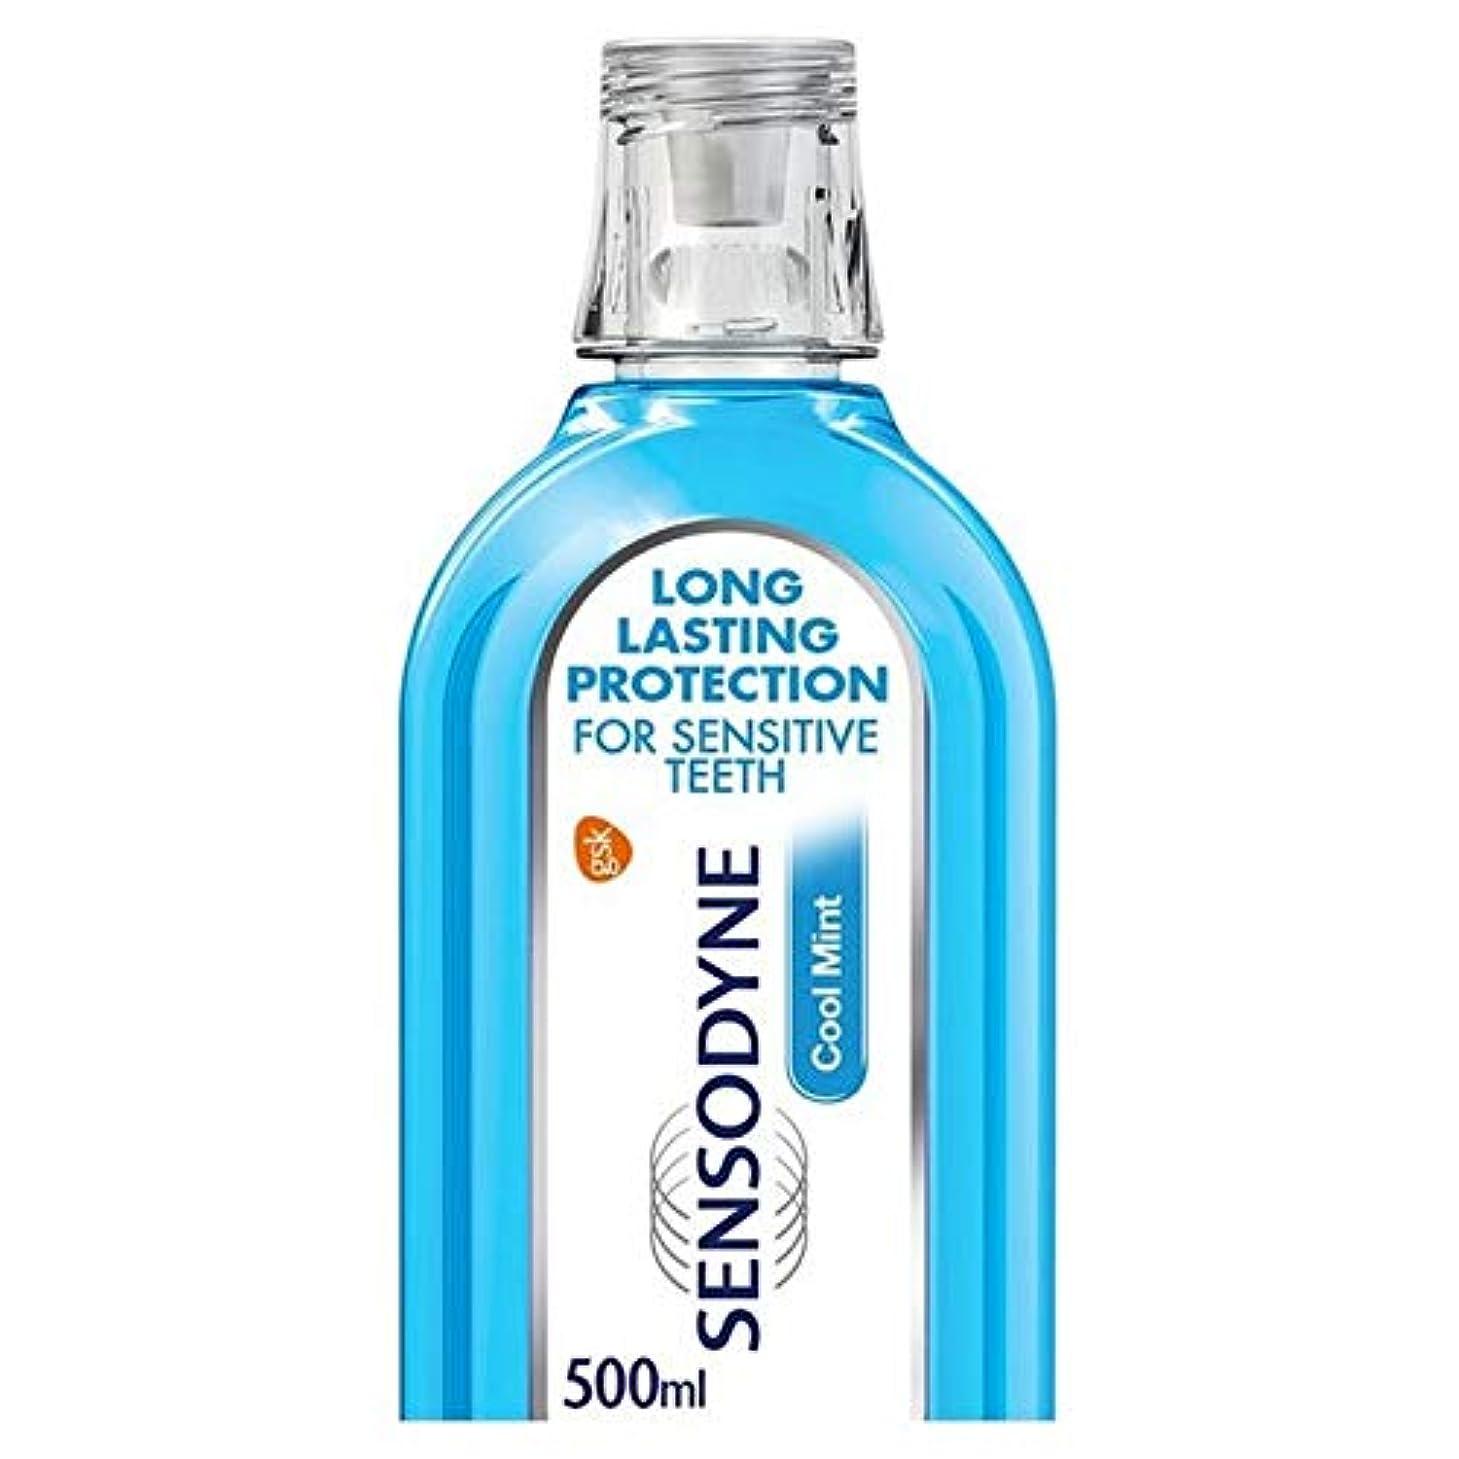 [Sensodyne] Sensodyneクールミント敏感ケアマウスウォッシュ500ミリリットル - Sensodyne Cool Mint Sensitive Care Mouthwash 500ml [並行輸入品]